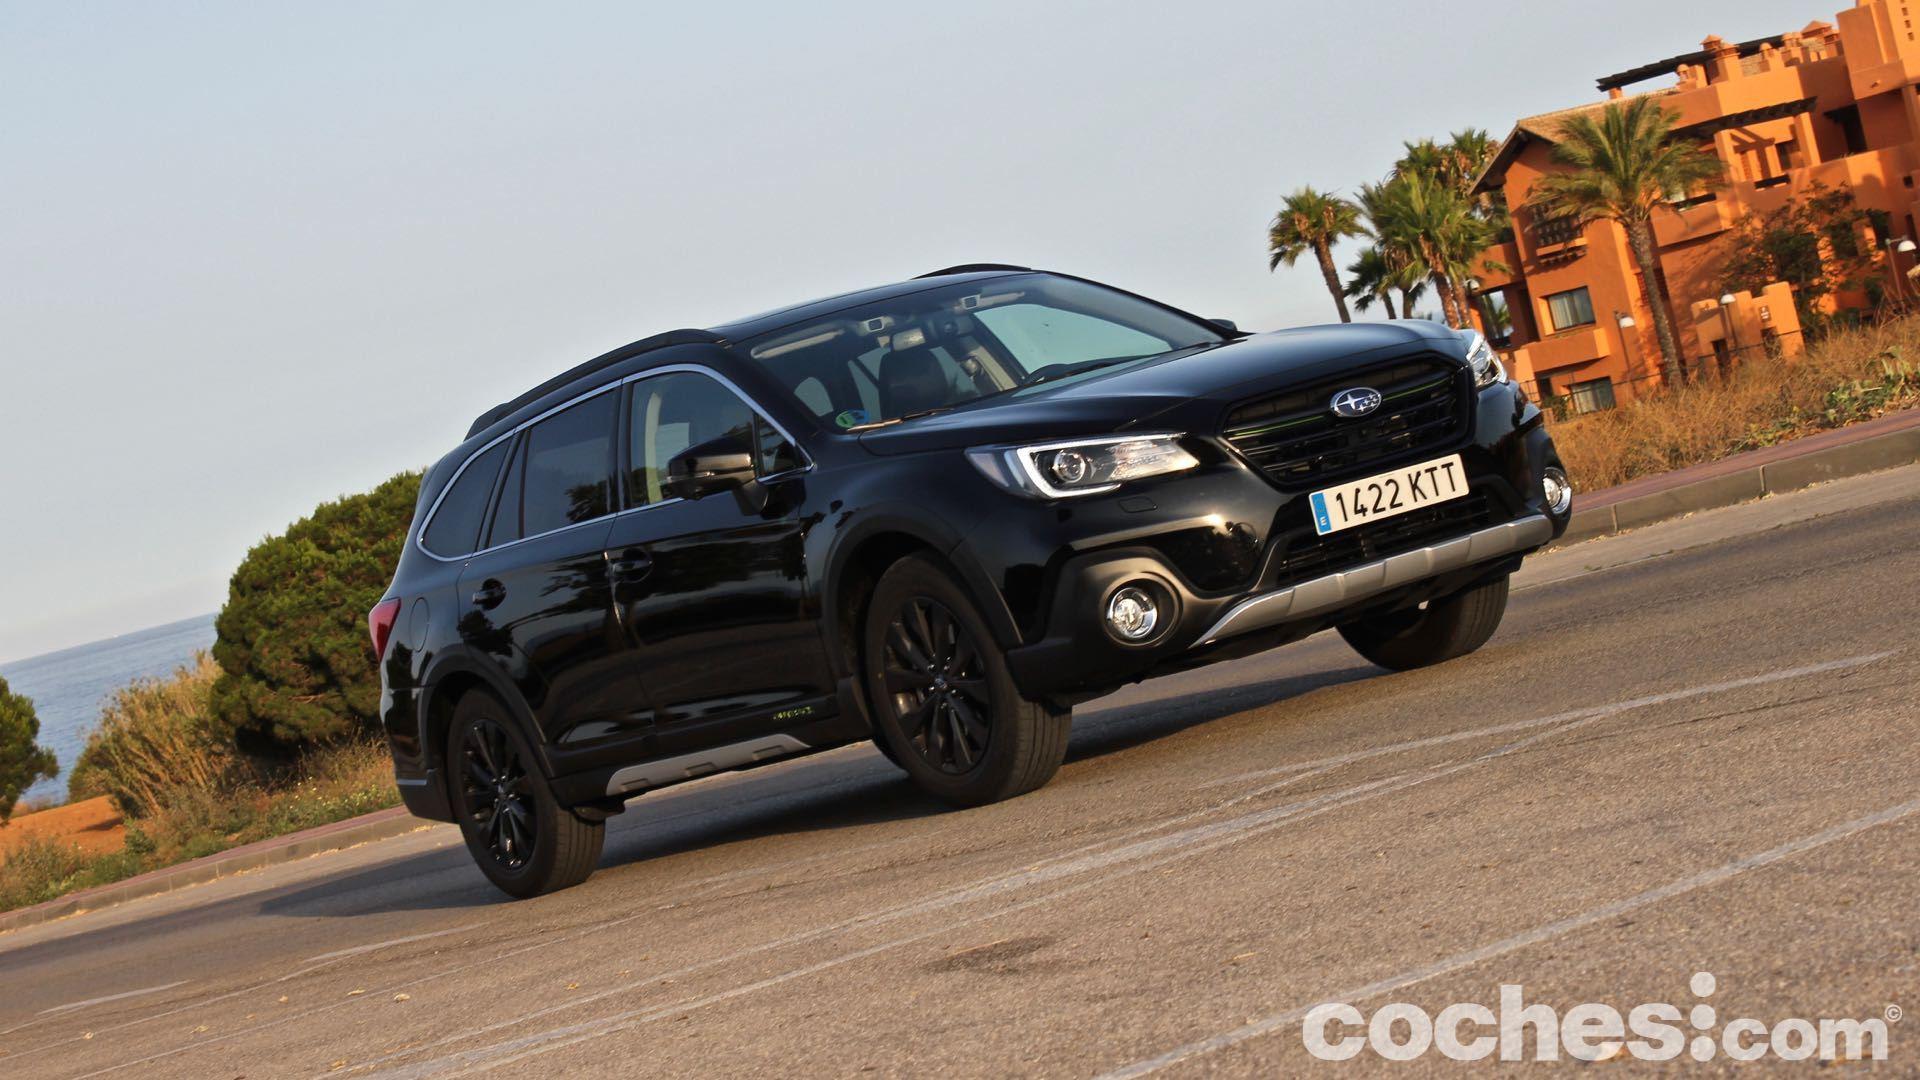 Subaru Outback ECO GLP Black Edition prueba exterior – 16